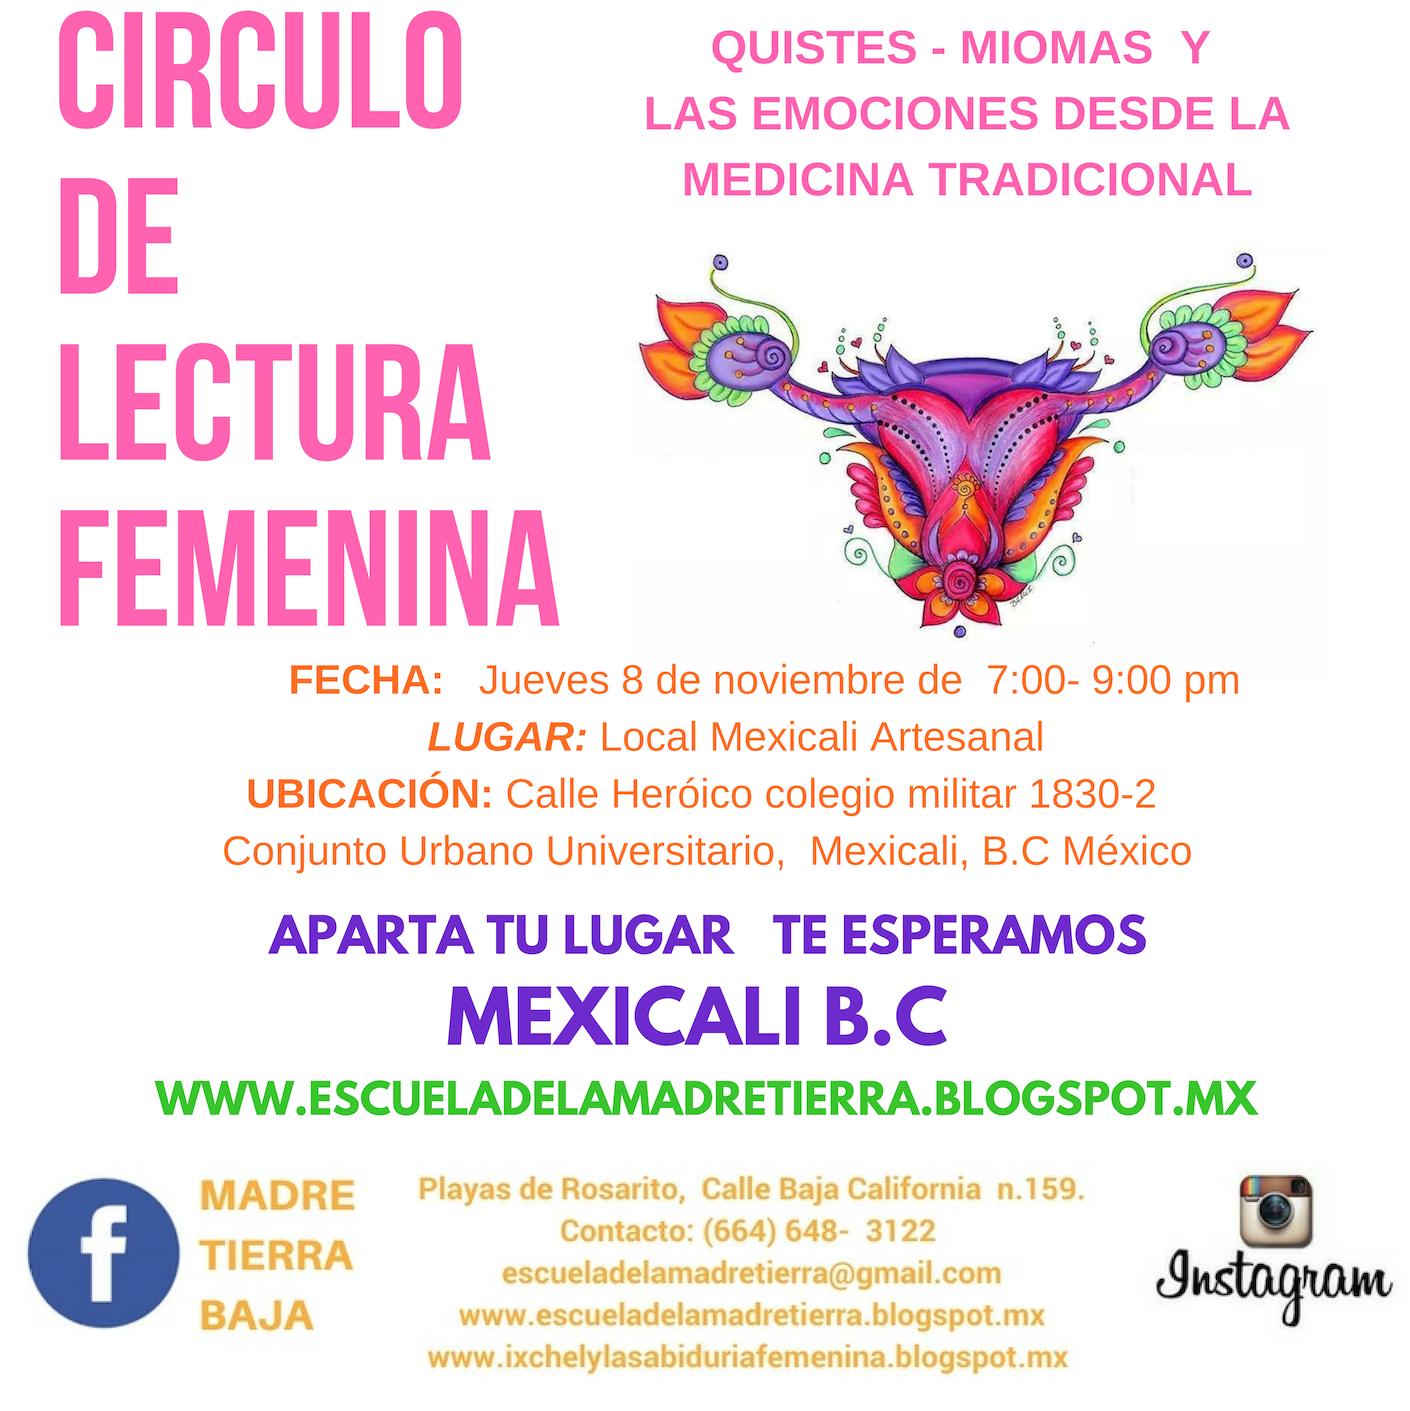 CIRUCLOS DE LECTURA SOBRE SALUD FEMENIN 2018